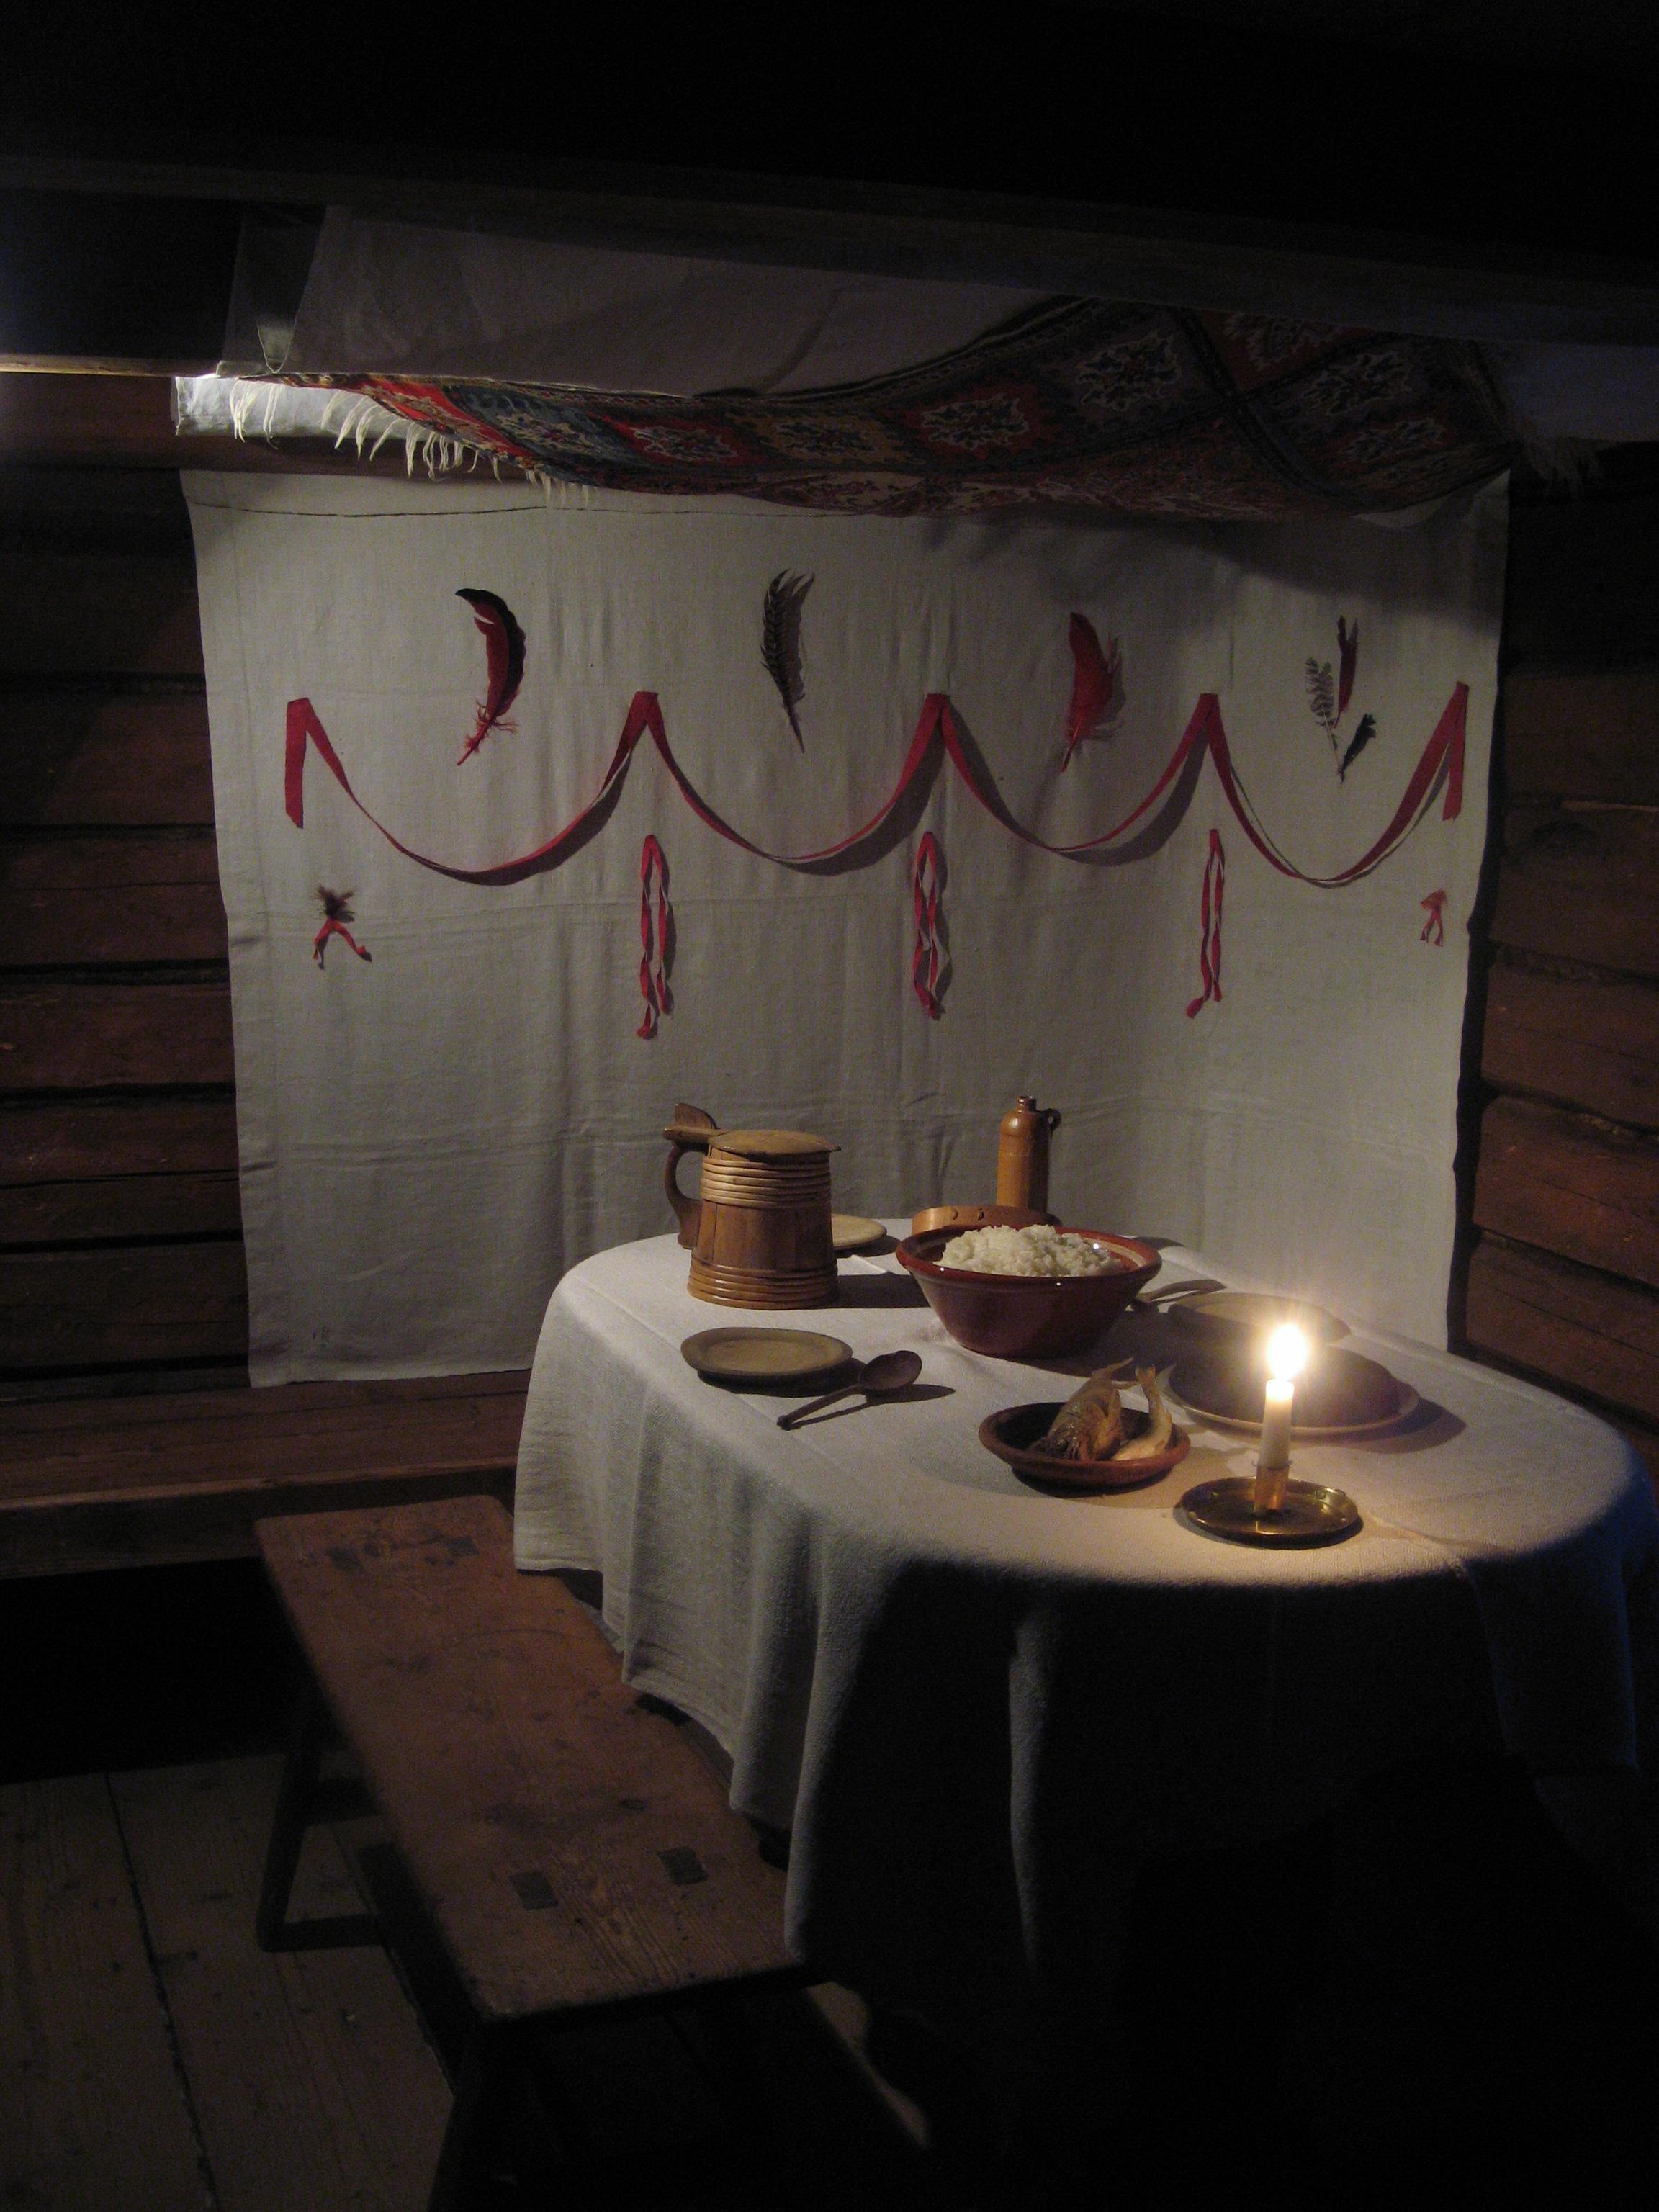 Christmas dinner as in the archipelago, at Luostarinmäki Handicrafts Museum, Turku. Photo taken on December 26, 2009.